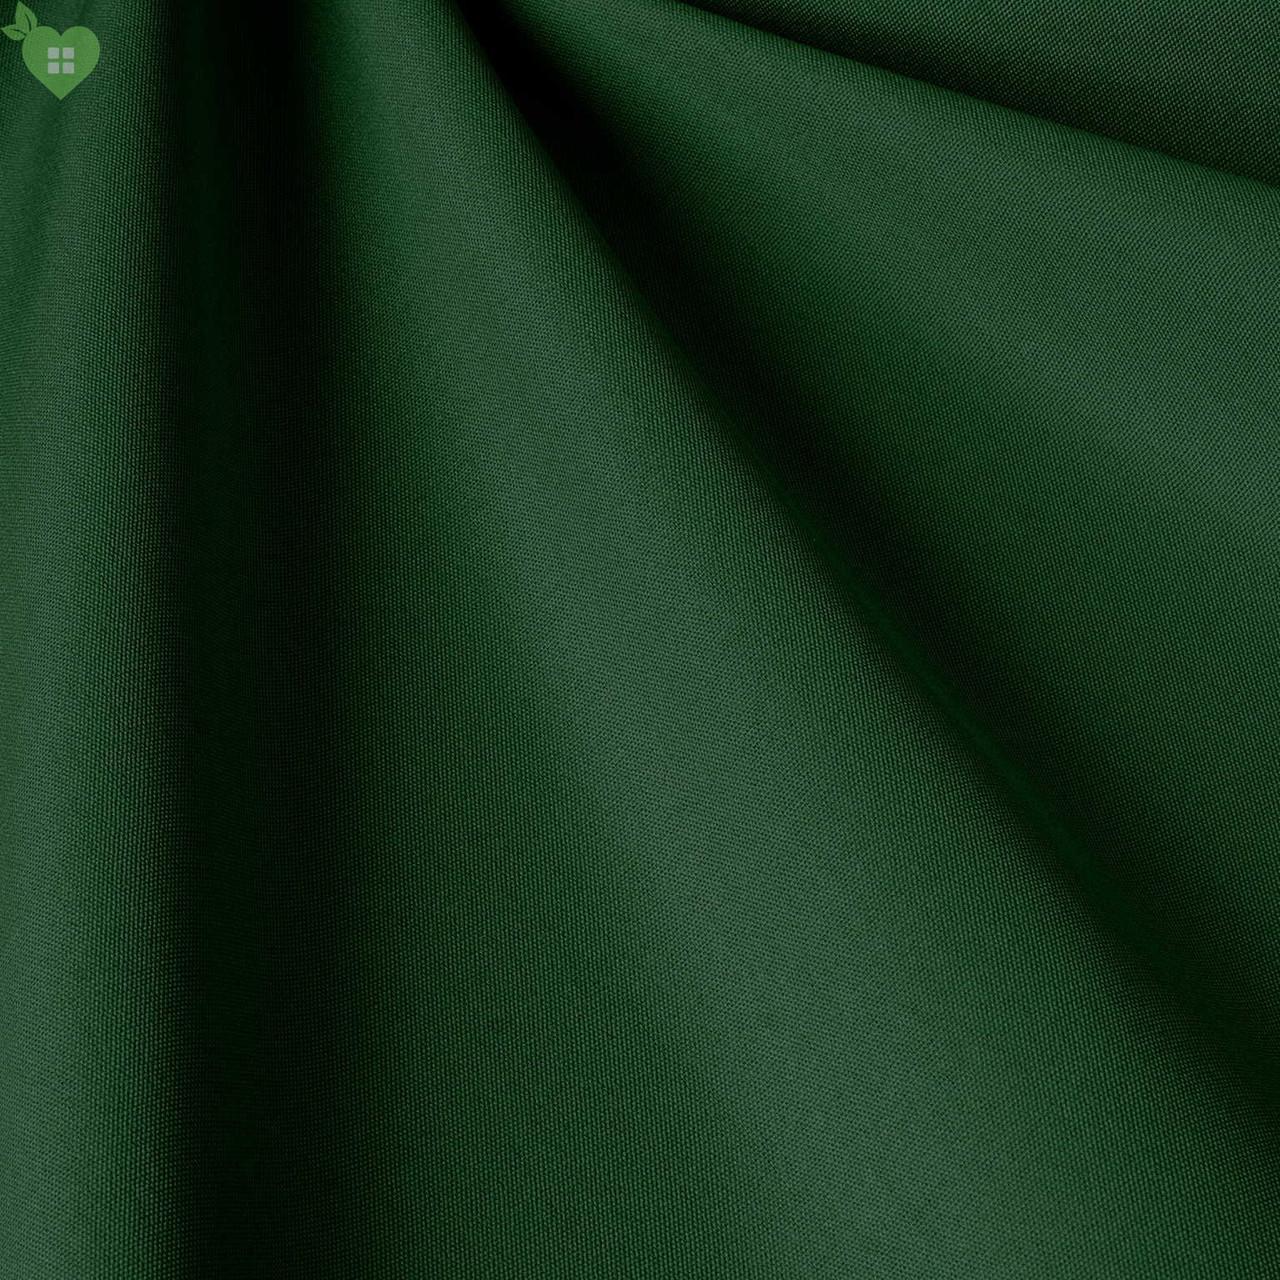 Ткань для улицы: Дралон (Outdoor) 83402v31